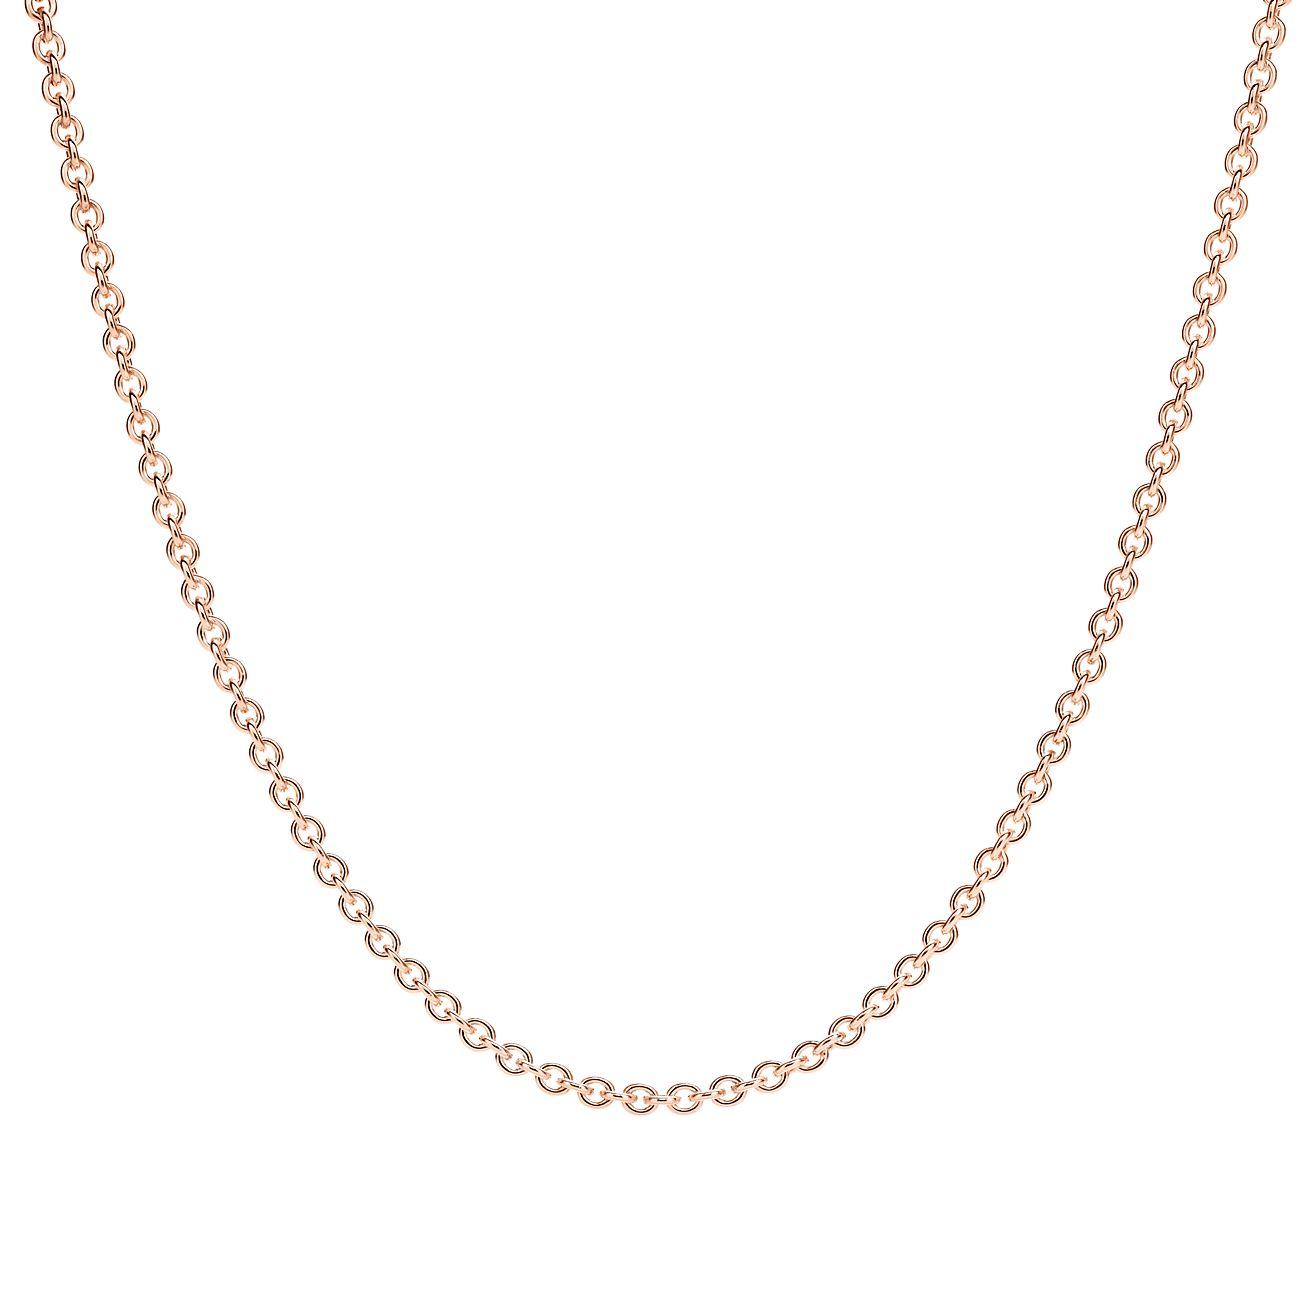 18k Rose Gold Chain ... f13cc6a53ace